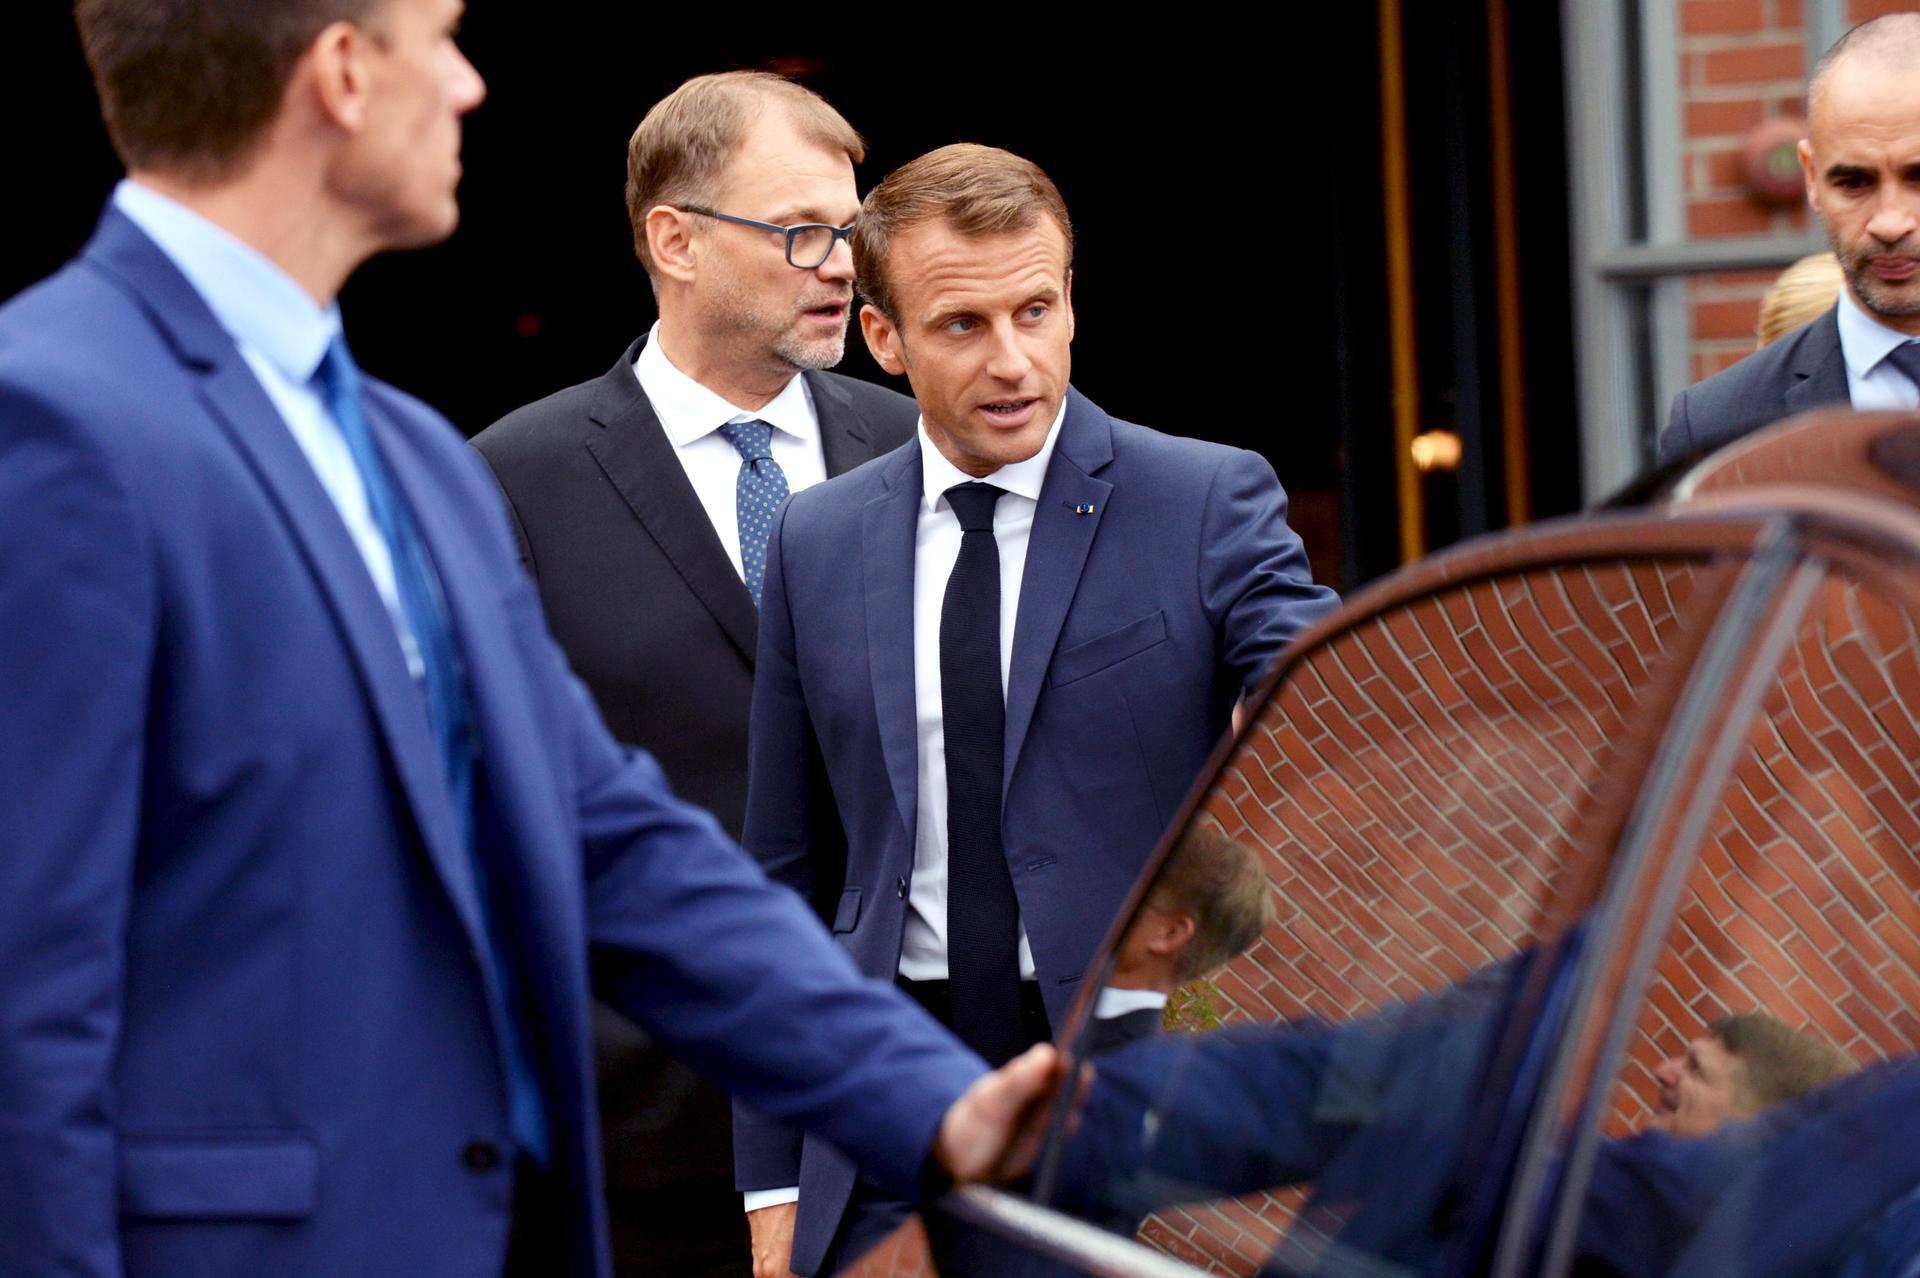 Ranskan Presidentti